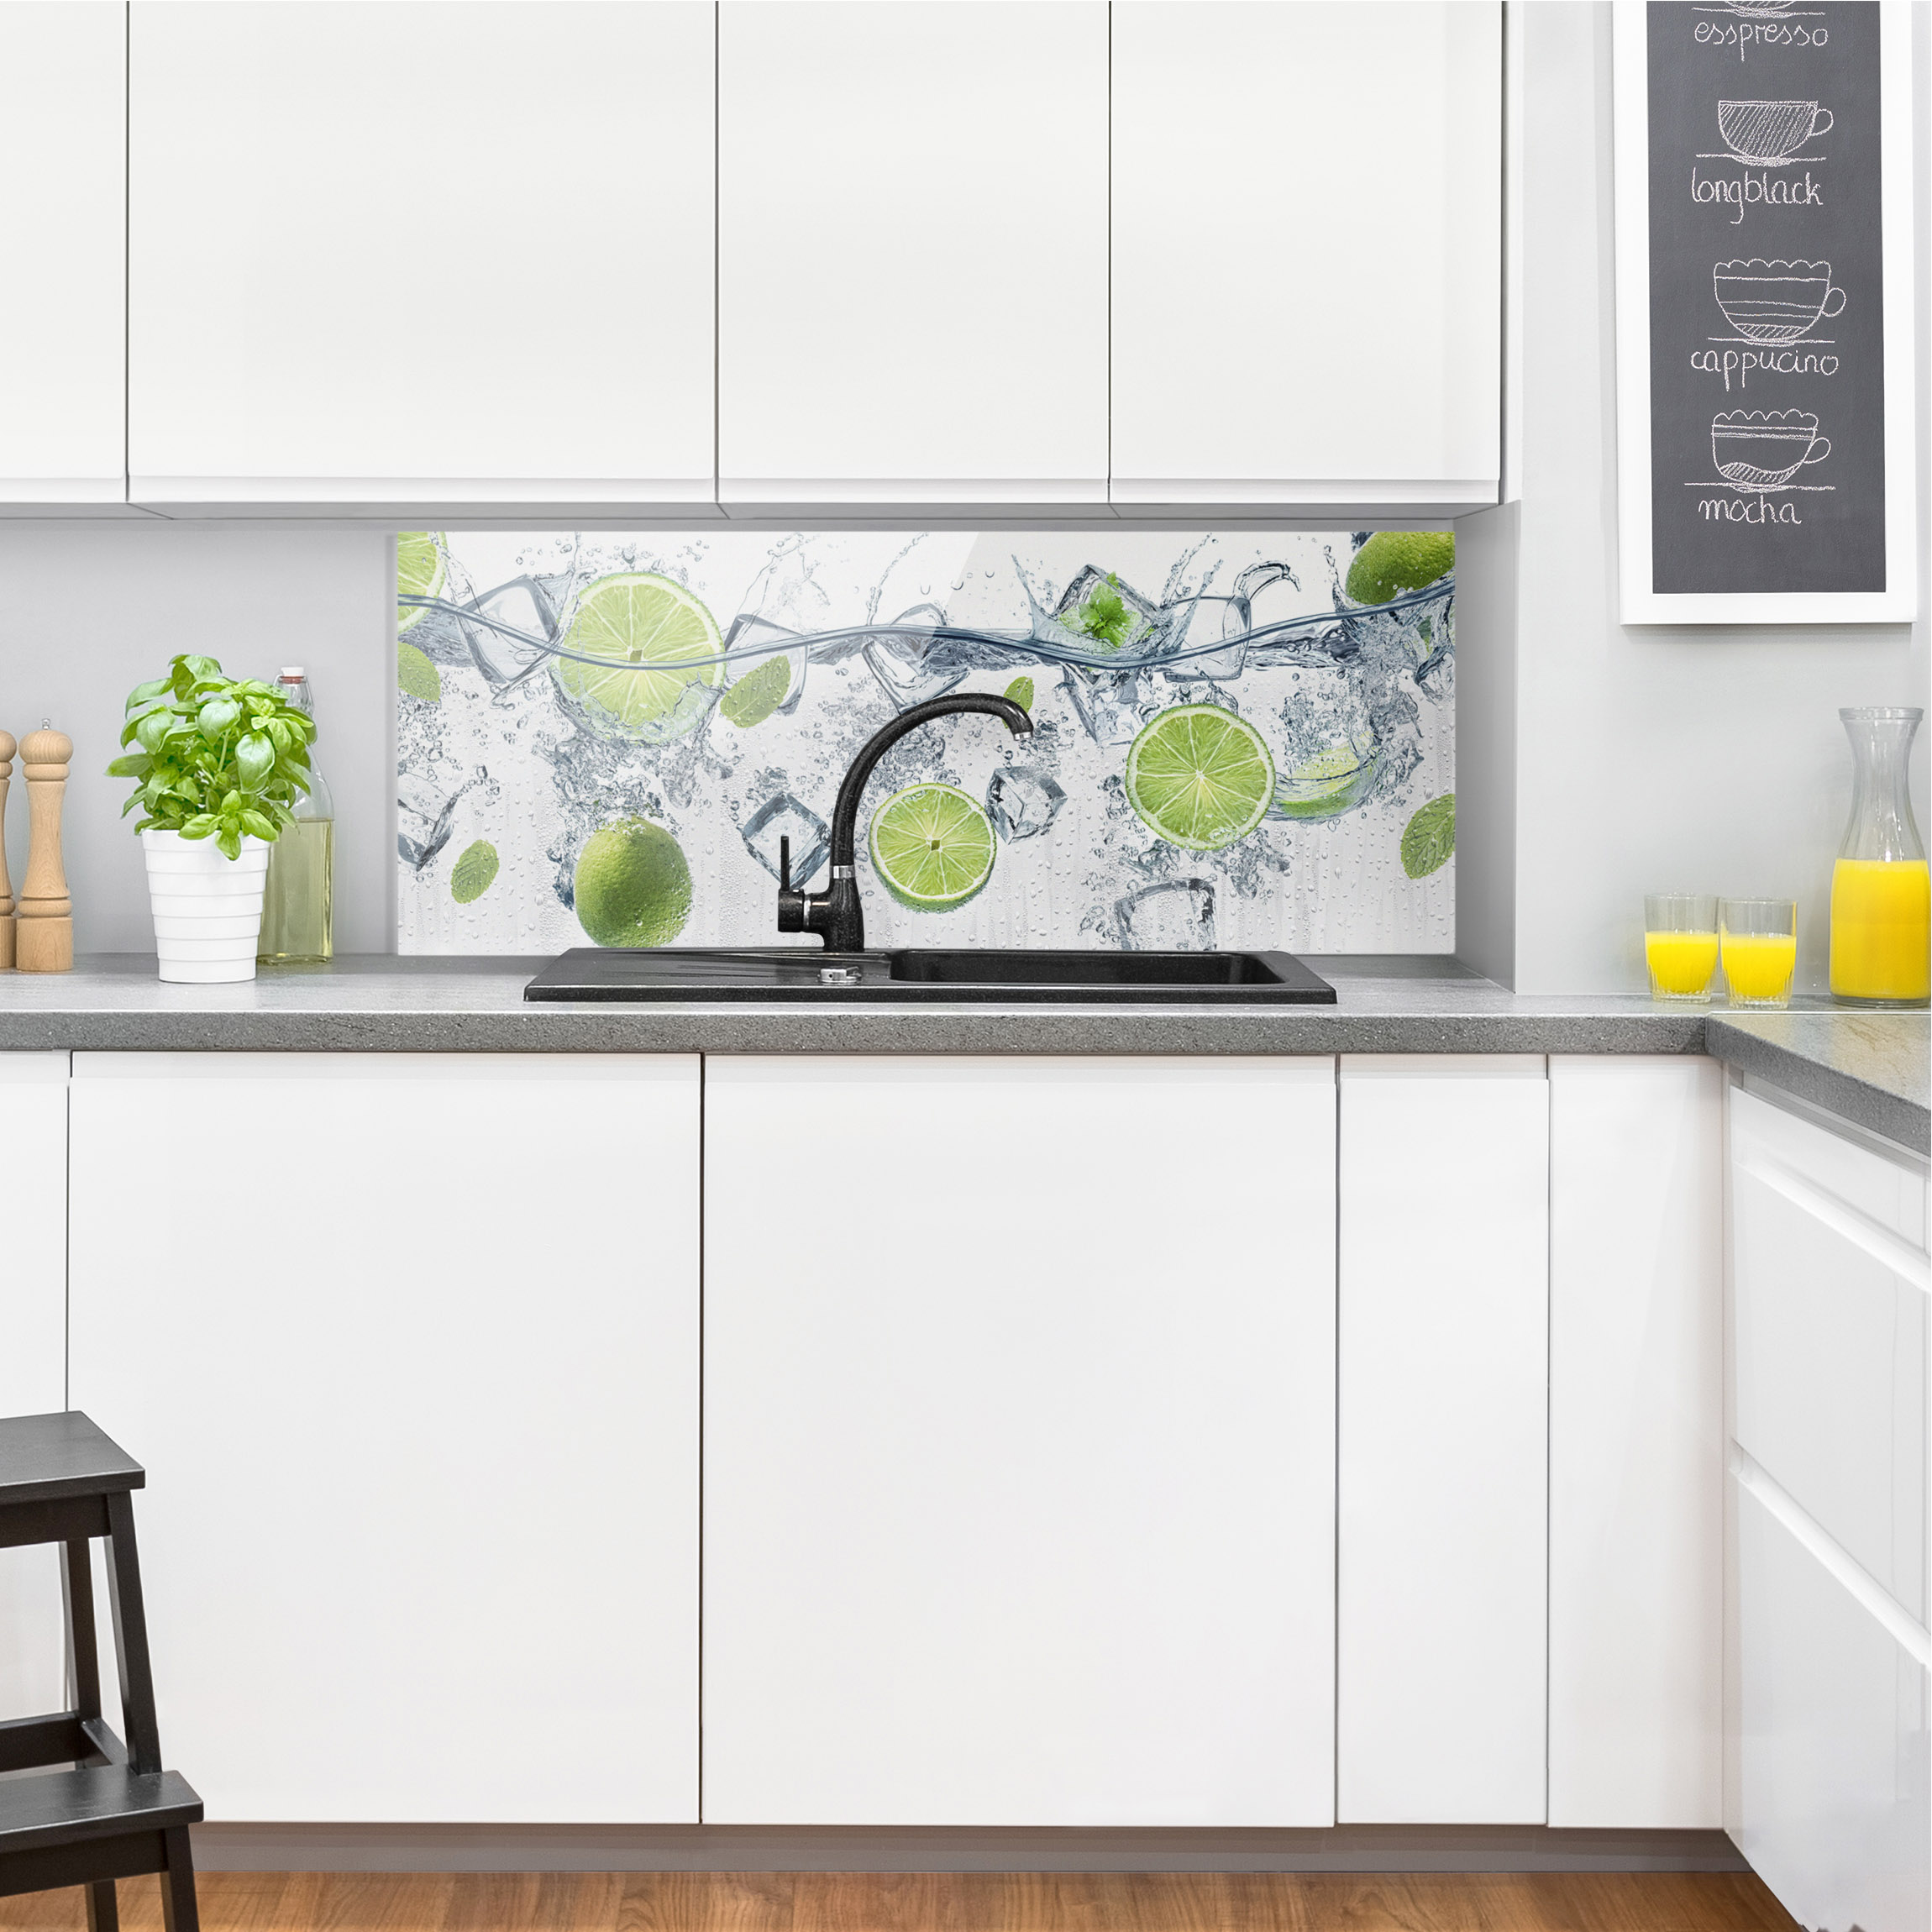 spritzschutz kuche glas limette. Black Bedroom Furniture Sets. Home Design Ideas